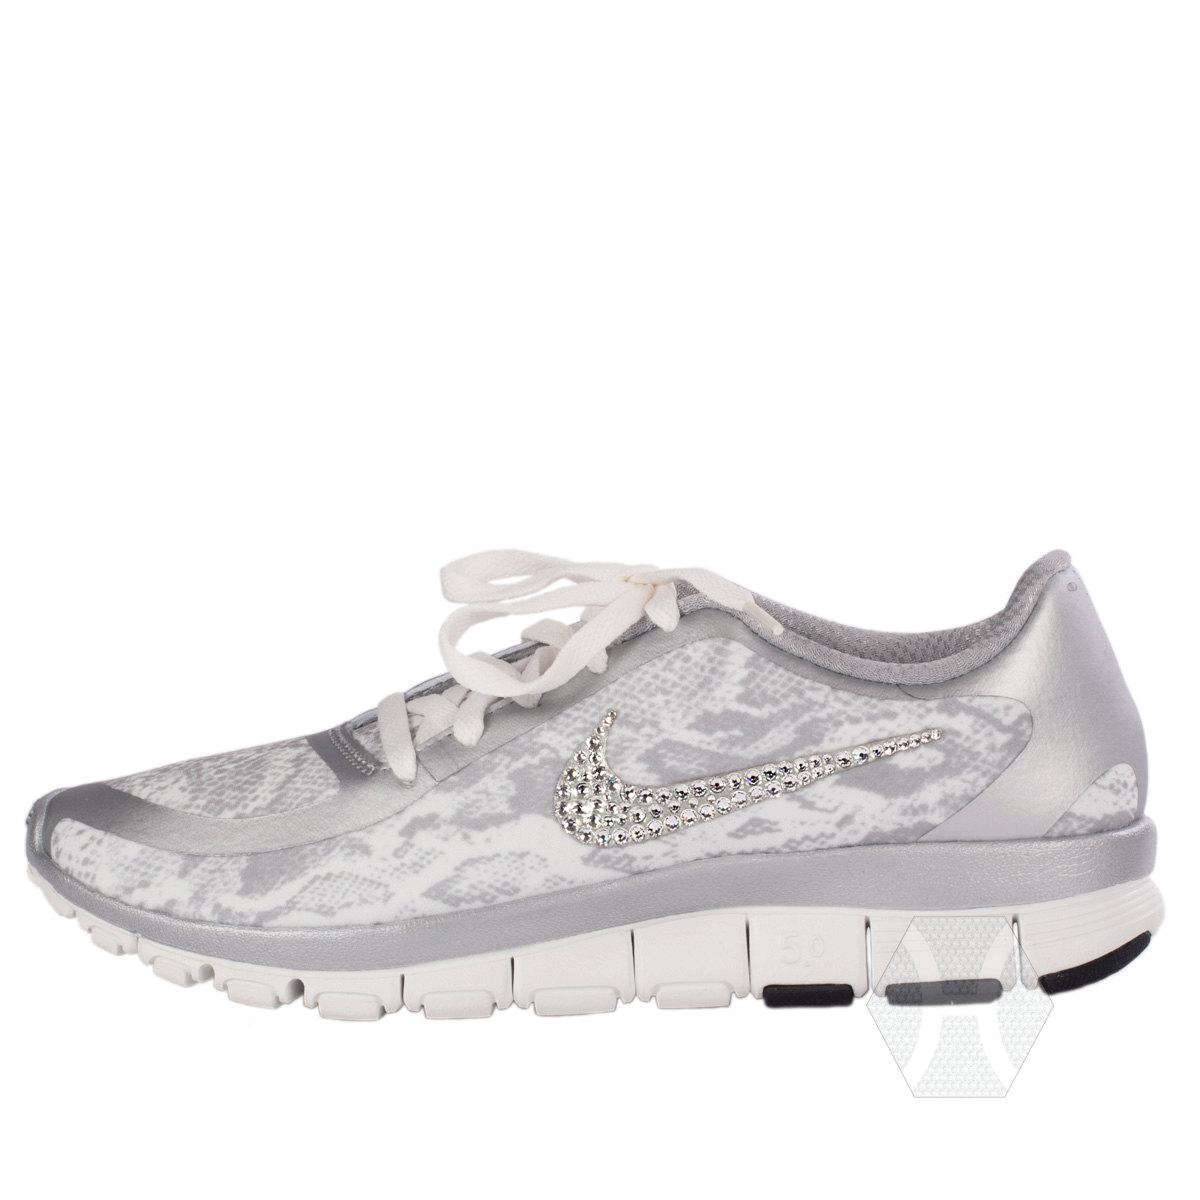 4830cd9df5220 Women's Nike Free 5.0 v4 in White/Grey Snakeskin with Swarovski crystal  detail